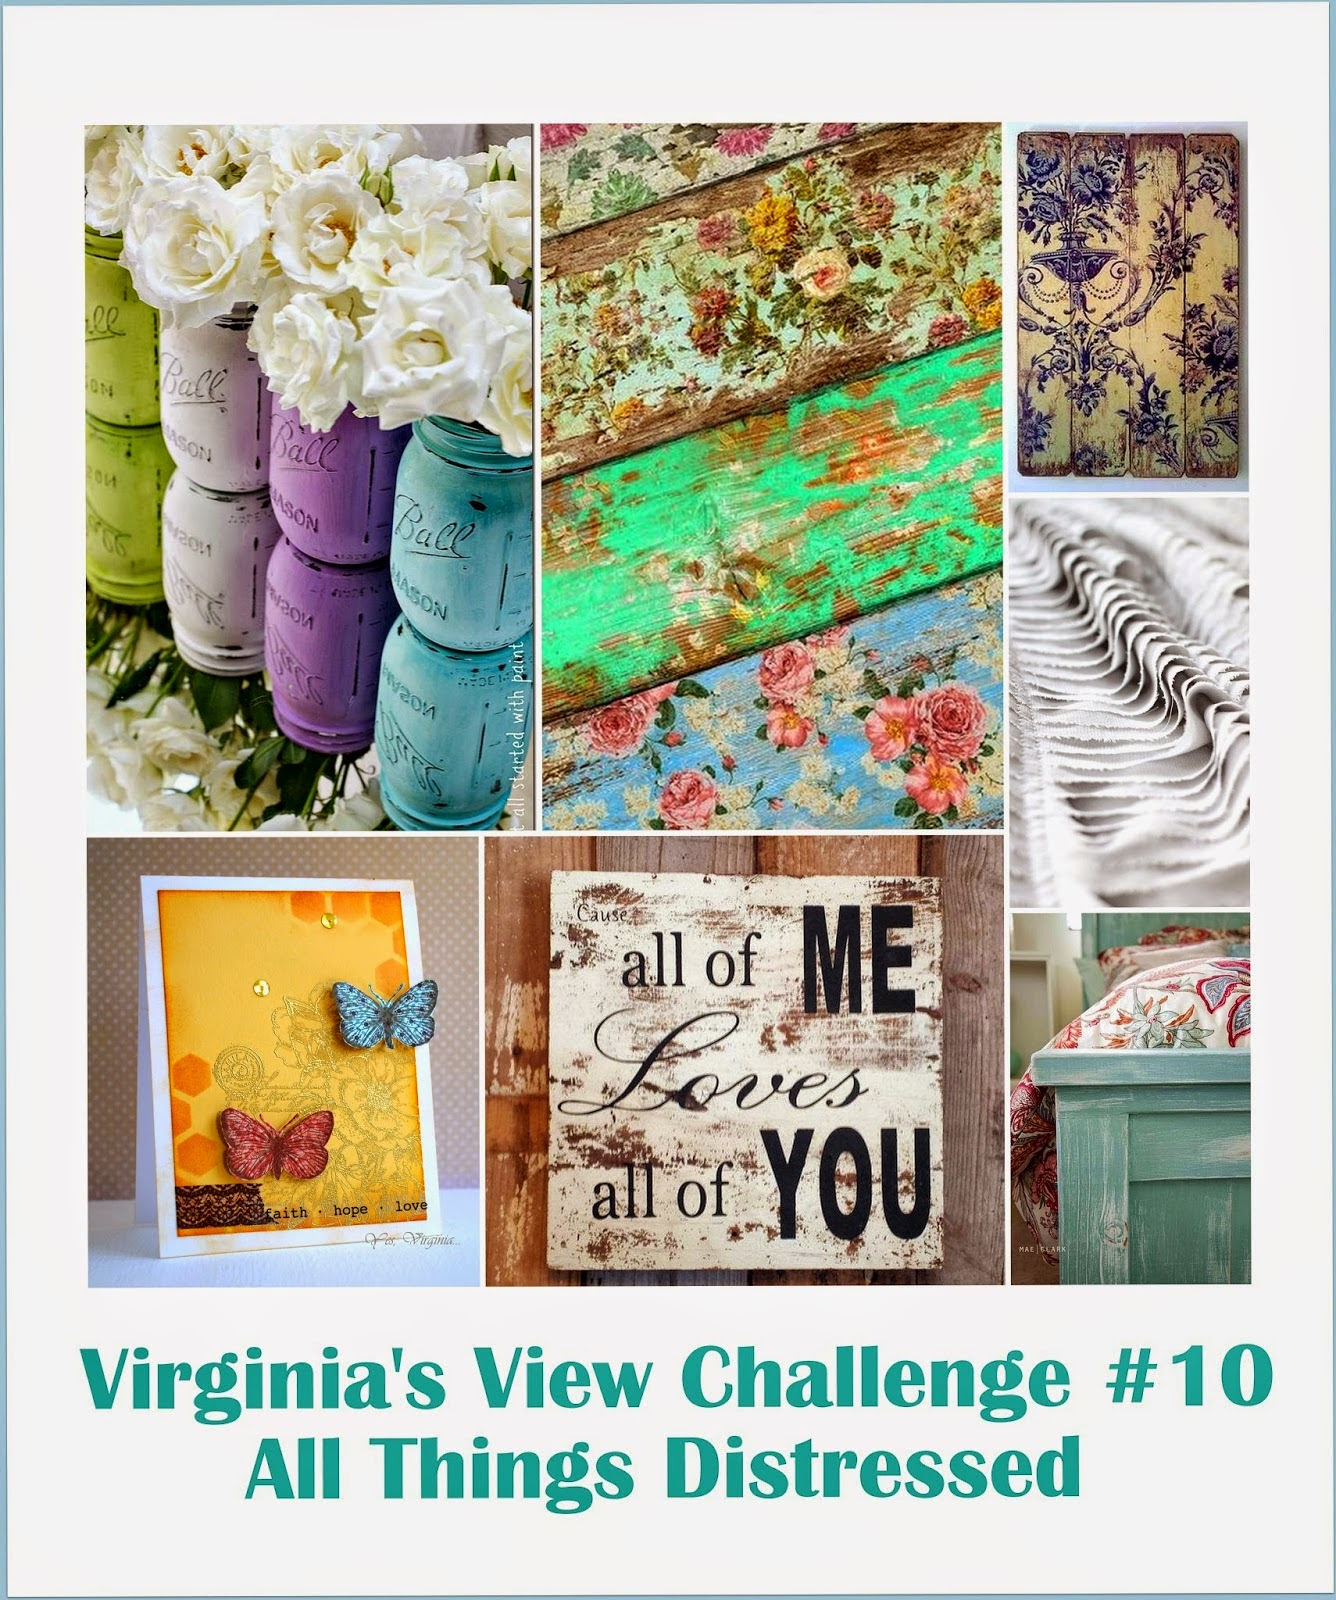 http://virginiasviewchallenge.blogspot.com.au/2014/12/virginias-view-challenge-10-guest.html